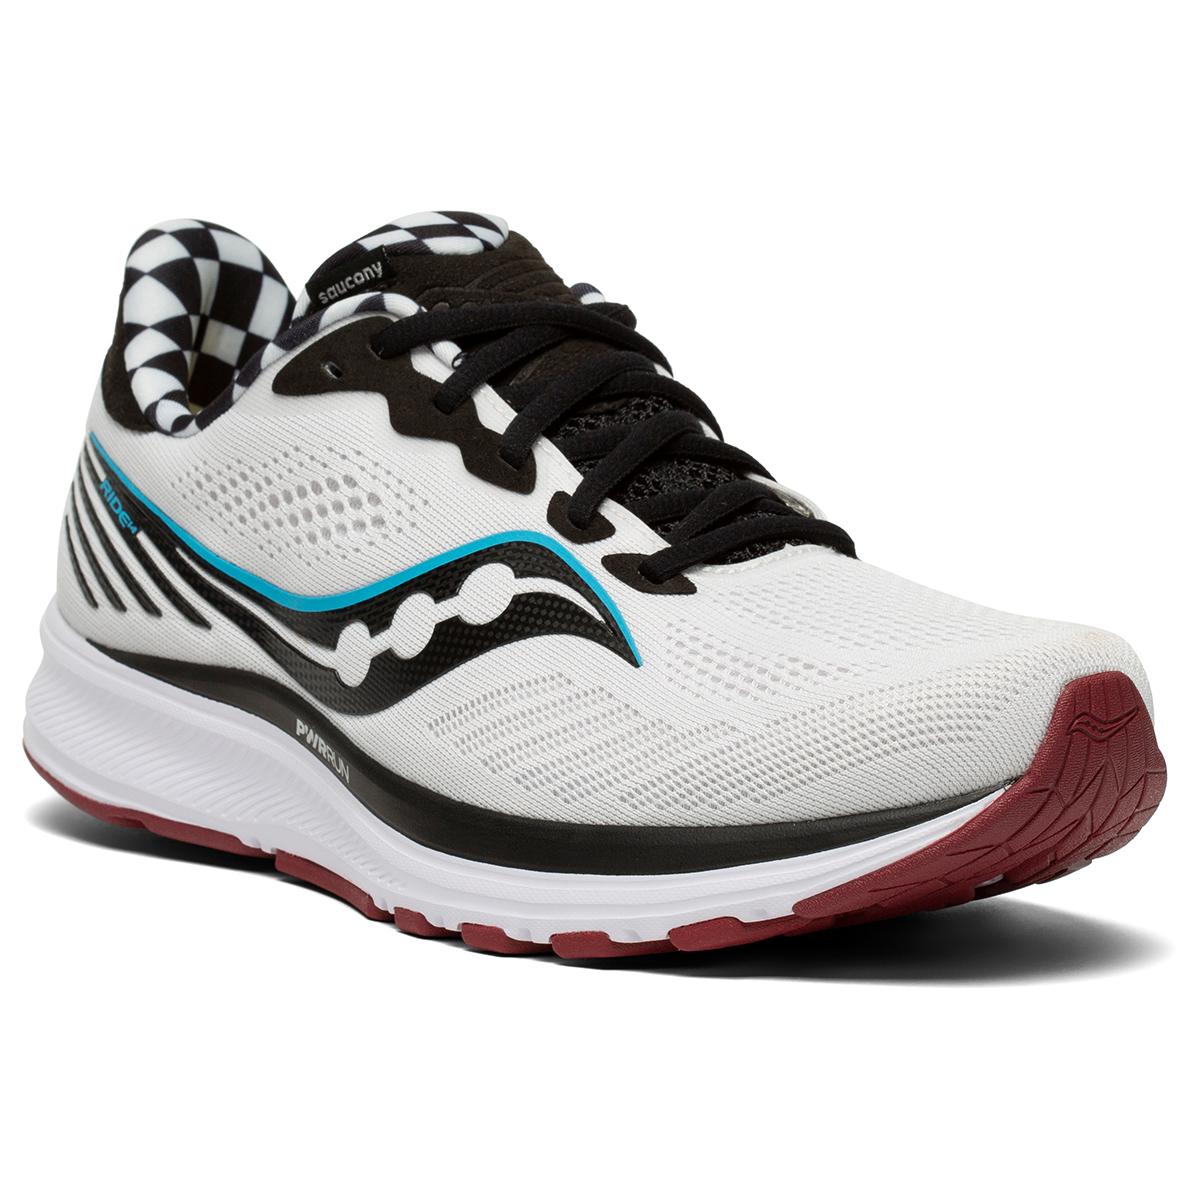 Men's Saucony Ride 14 Running Shoe - Color: Reverie - Size: 7 - Width: Regular, Reverie, large, image 3